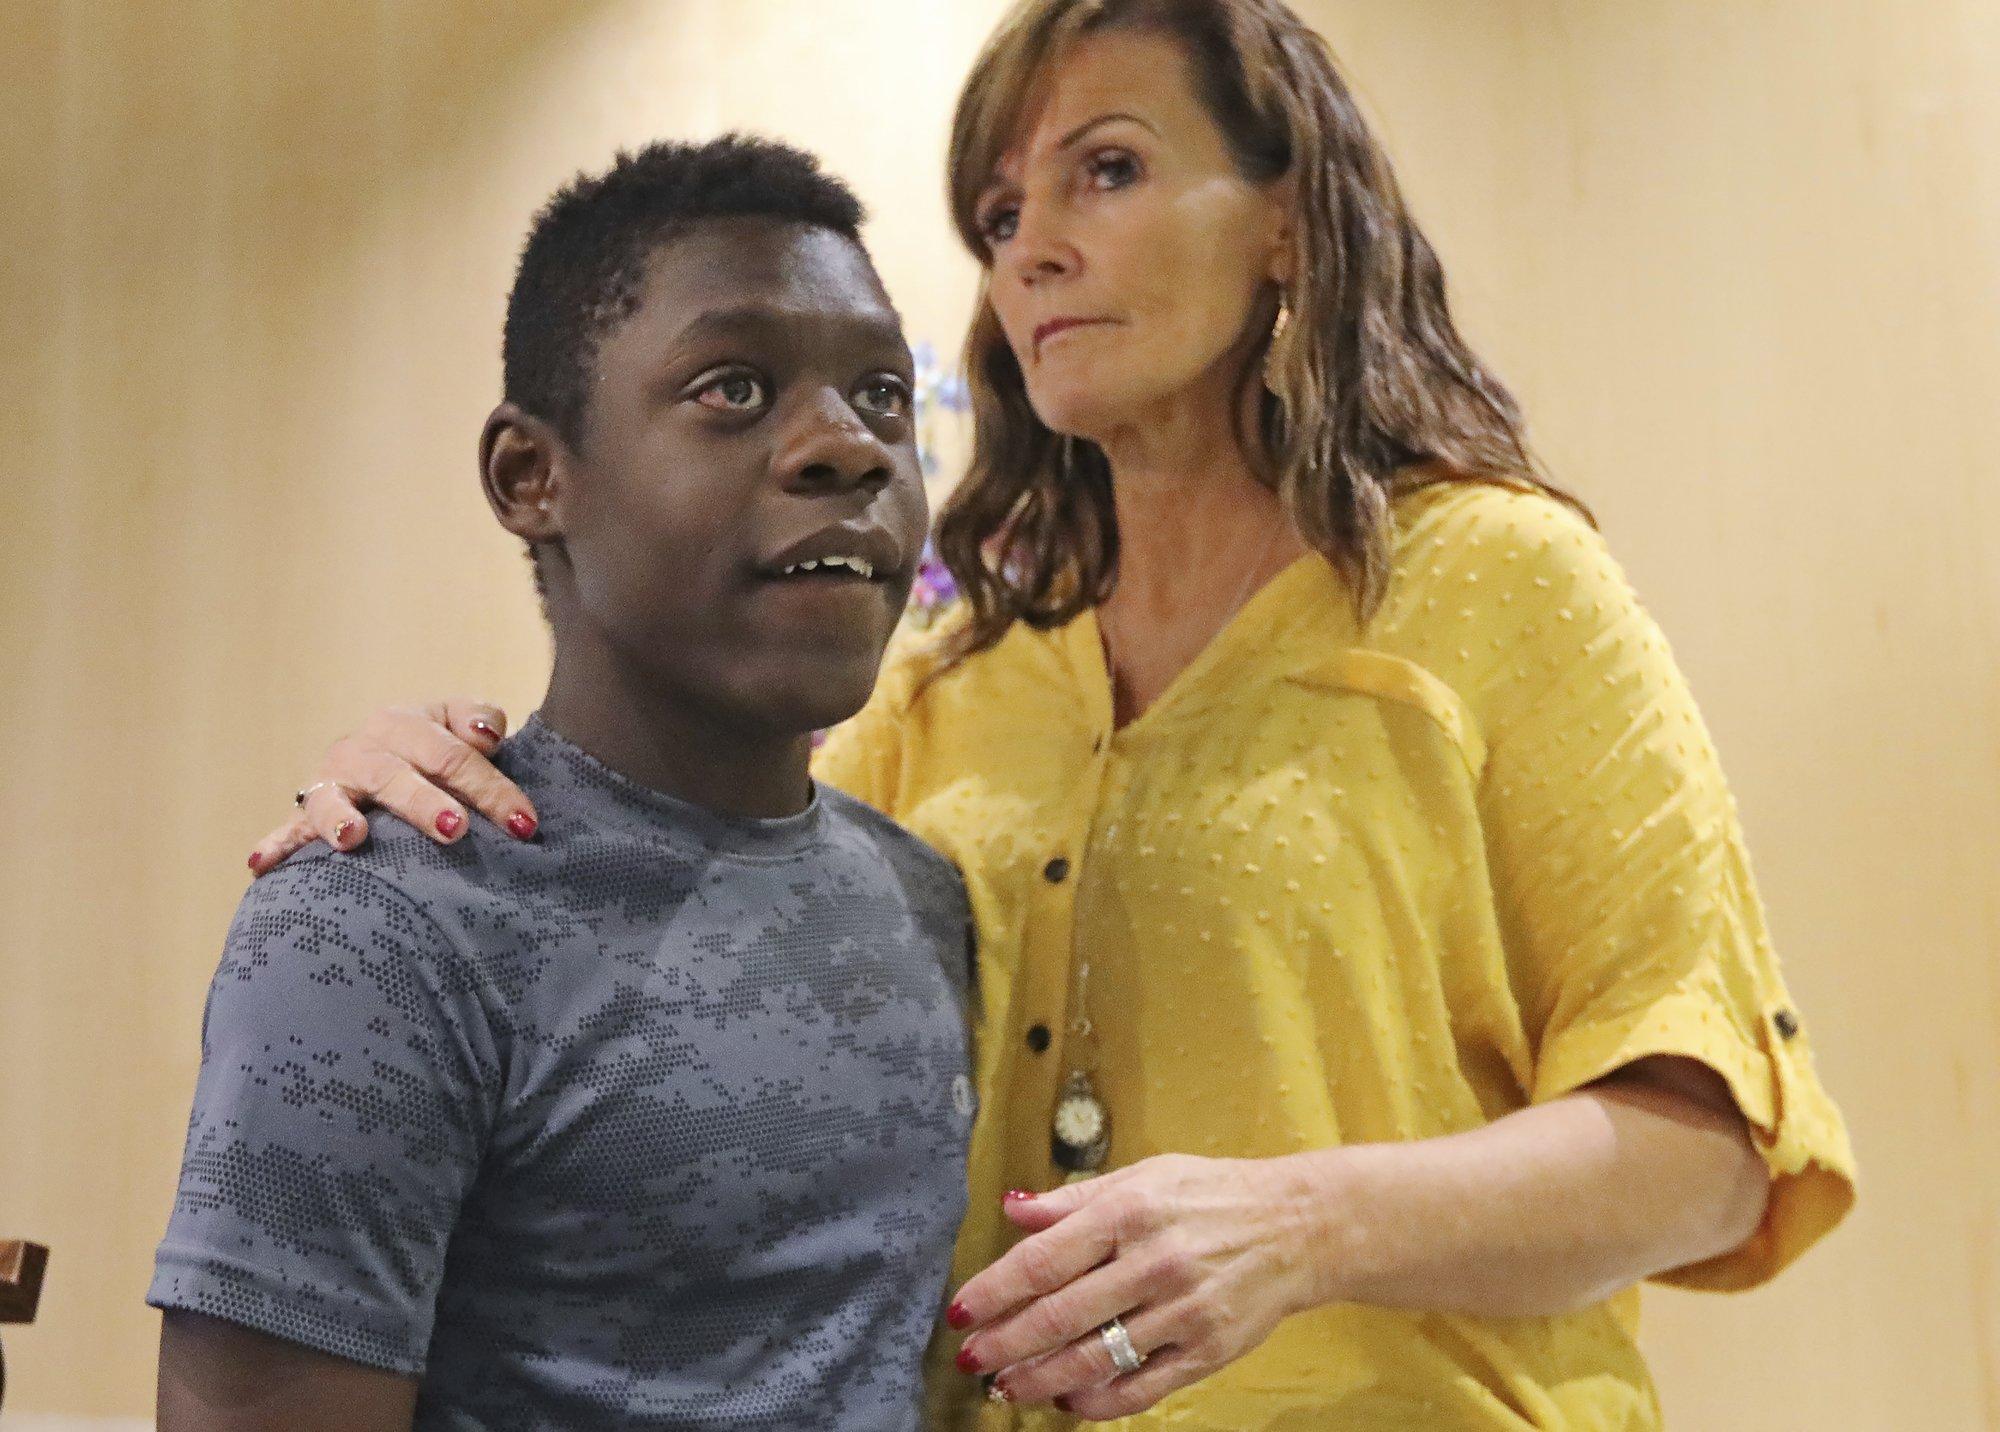 Mother says Utah officer pulled gun on her black son